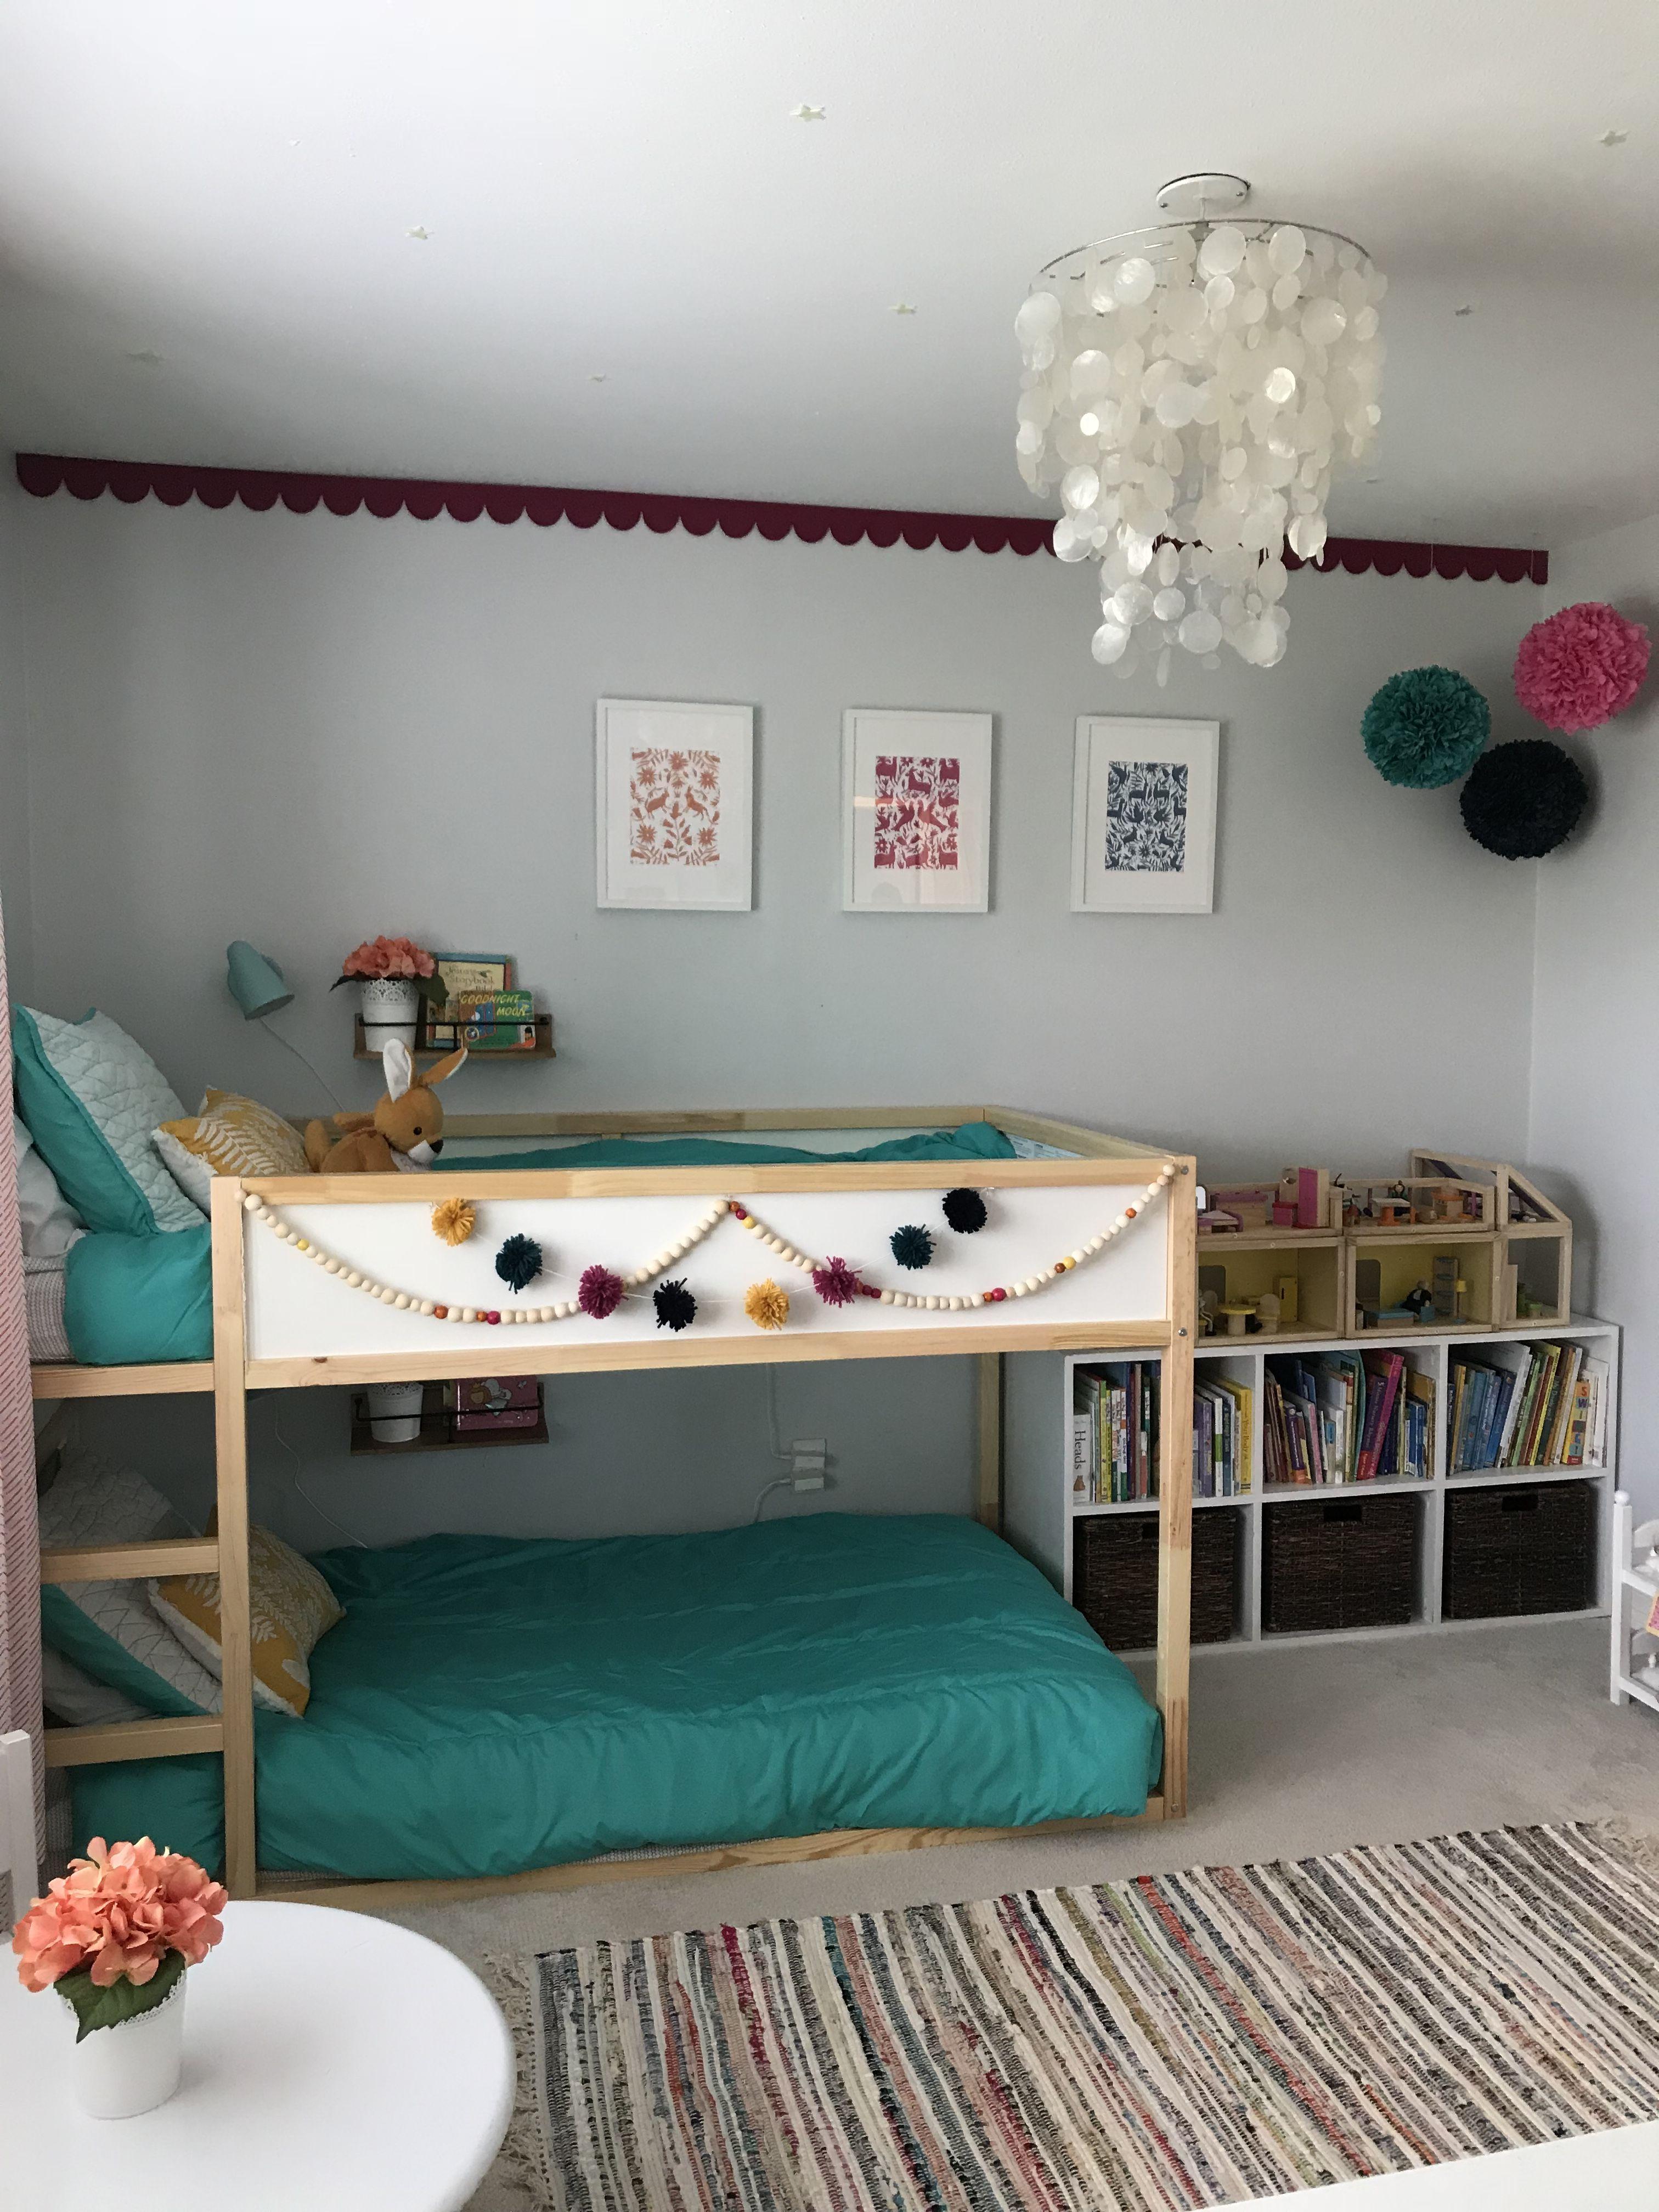 Little Girls Room Kura Bed From Ikea Otomi Prints